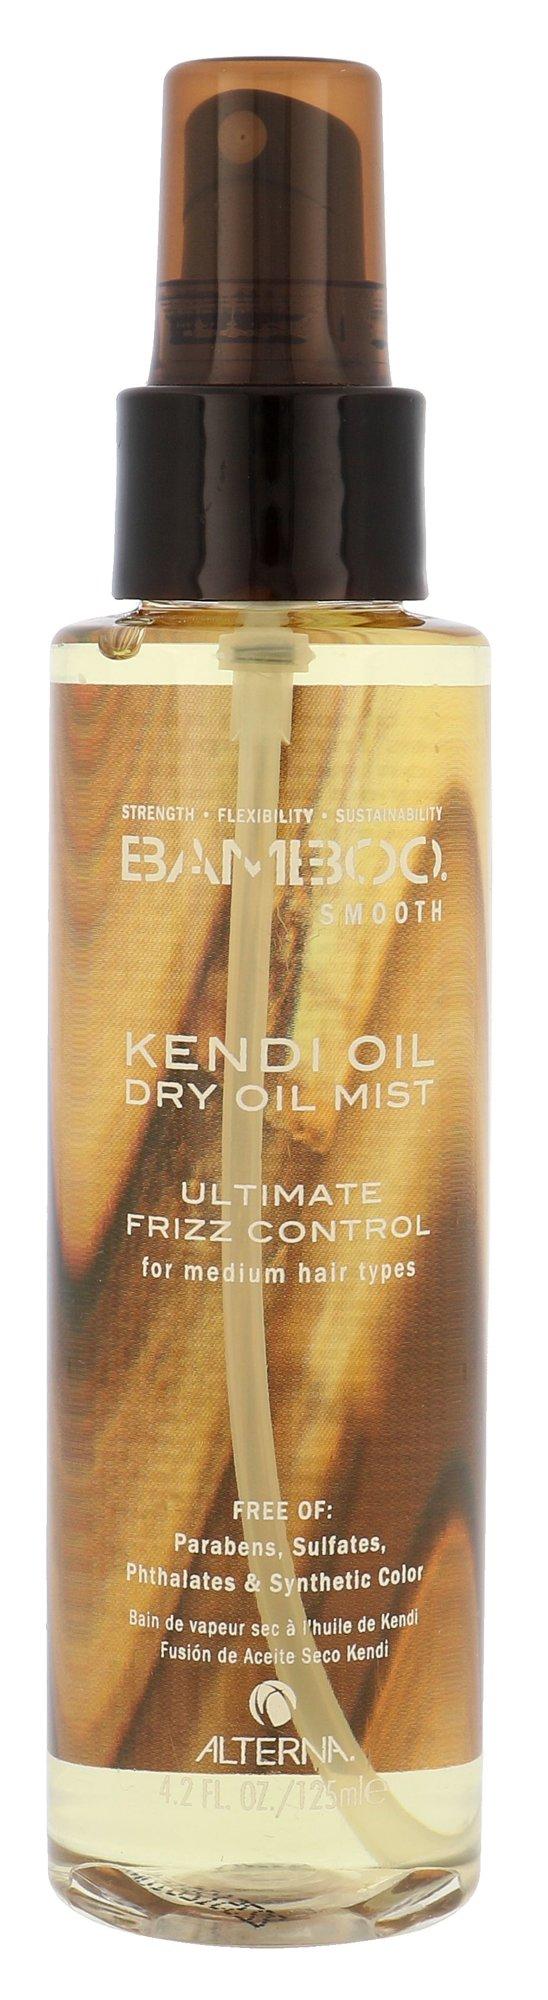 Alterna Bamboo Smooth Cosmetic 125ml